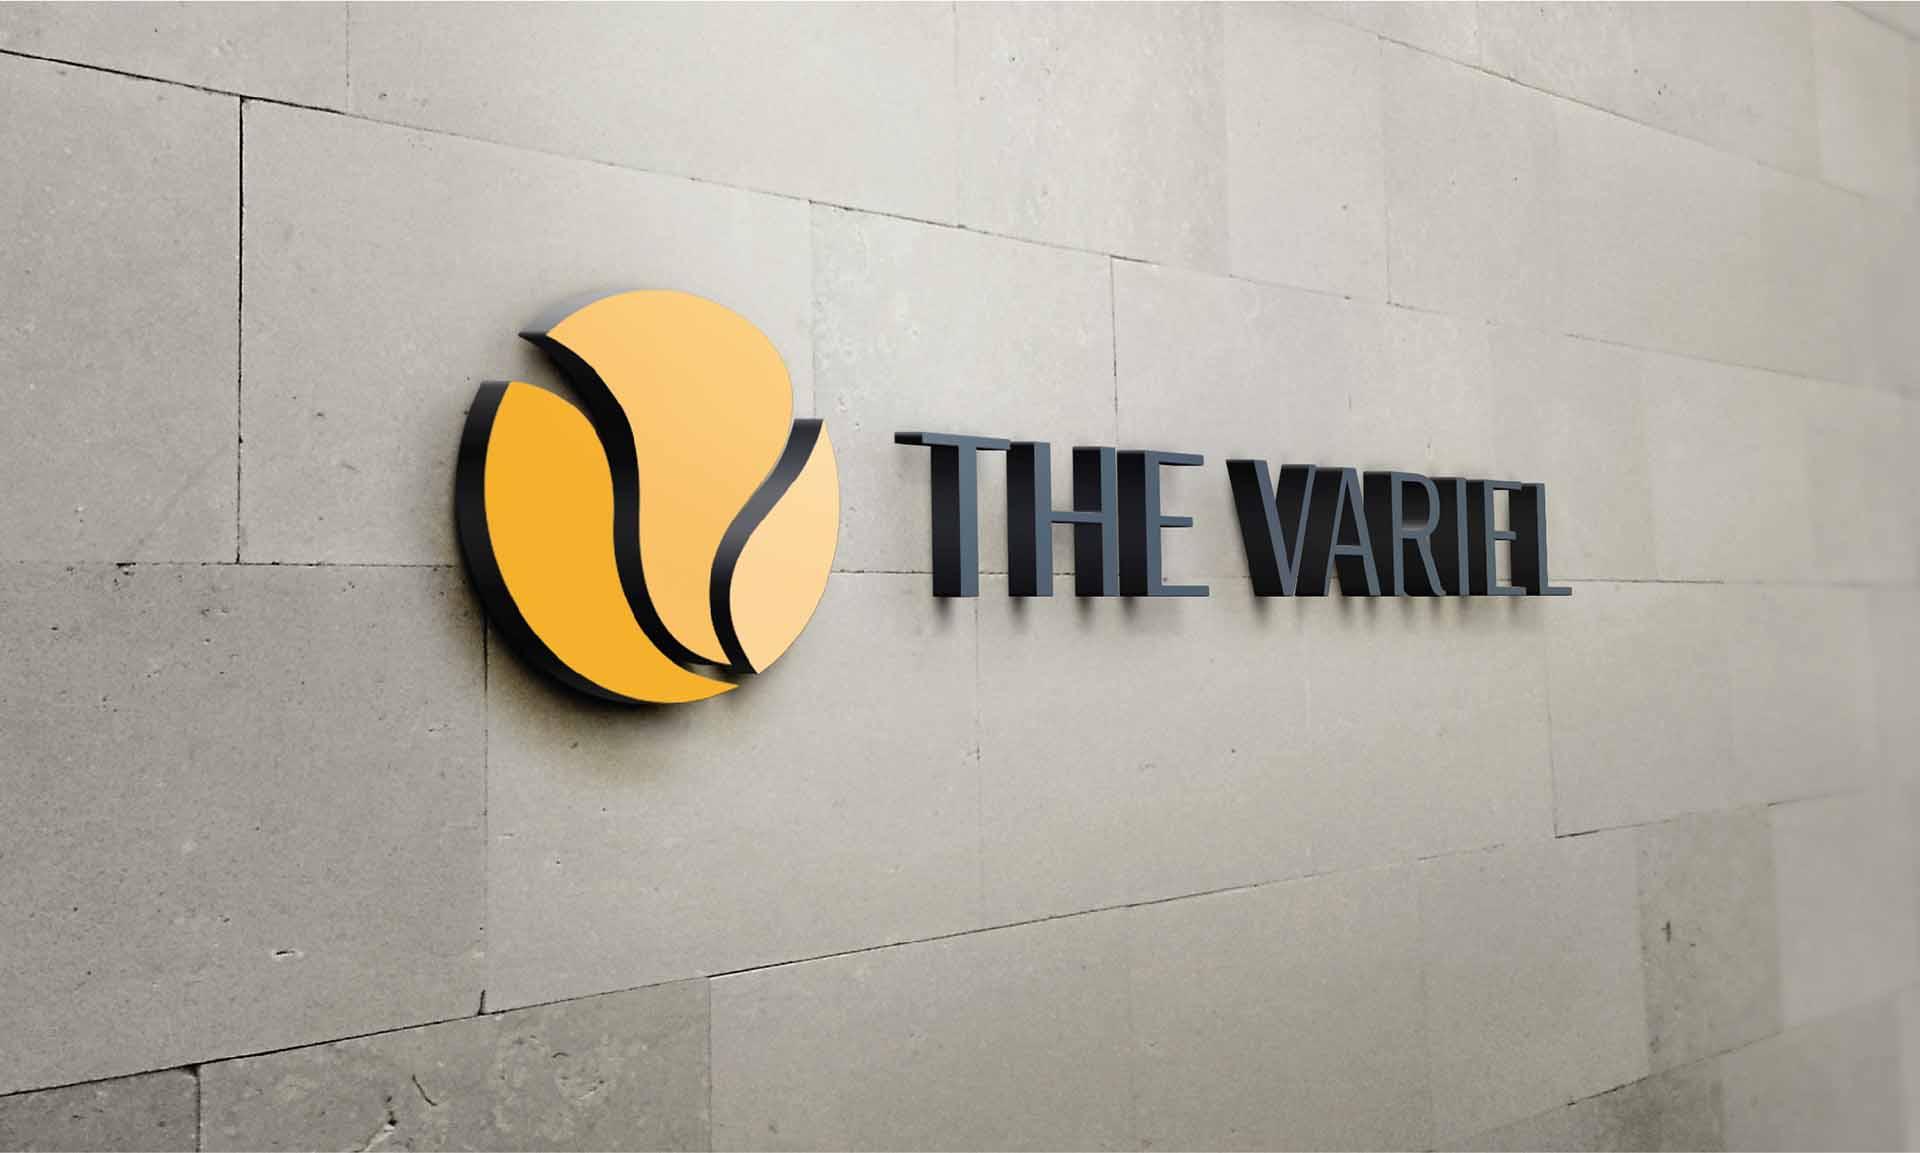 The Variel